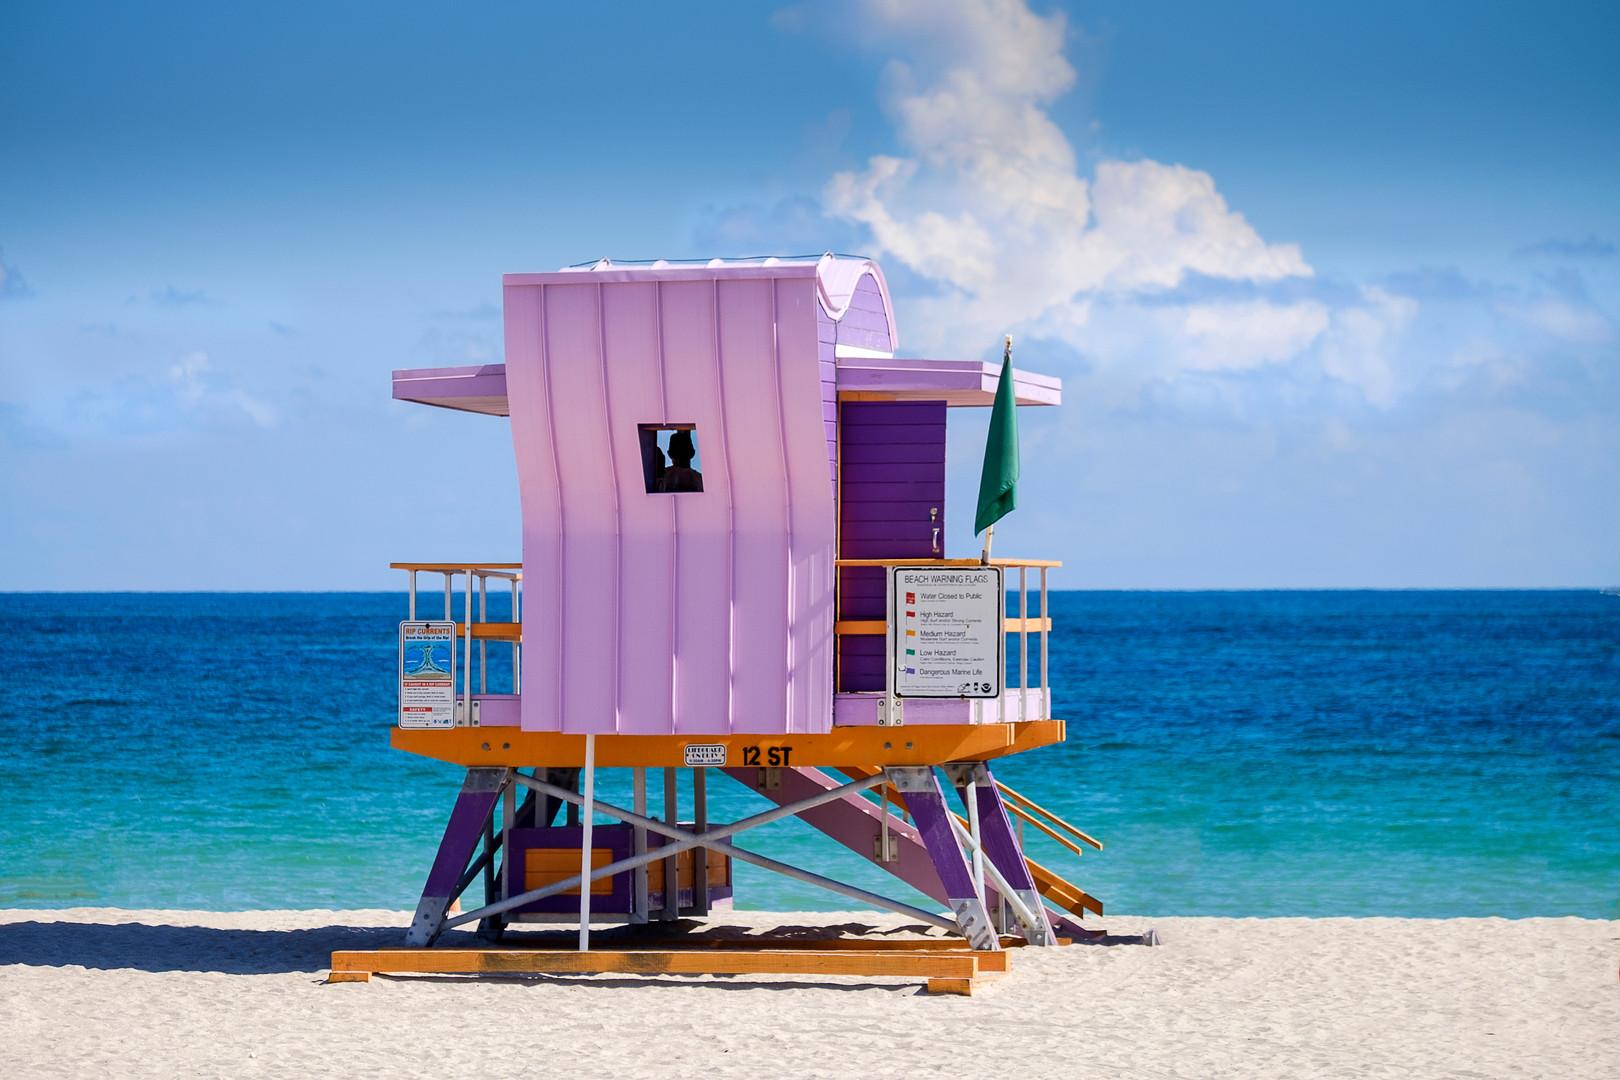 12th Street lifeguard stand South Beach, Miami, Florida